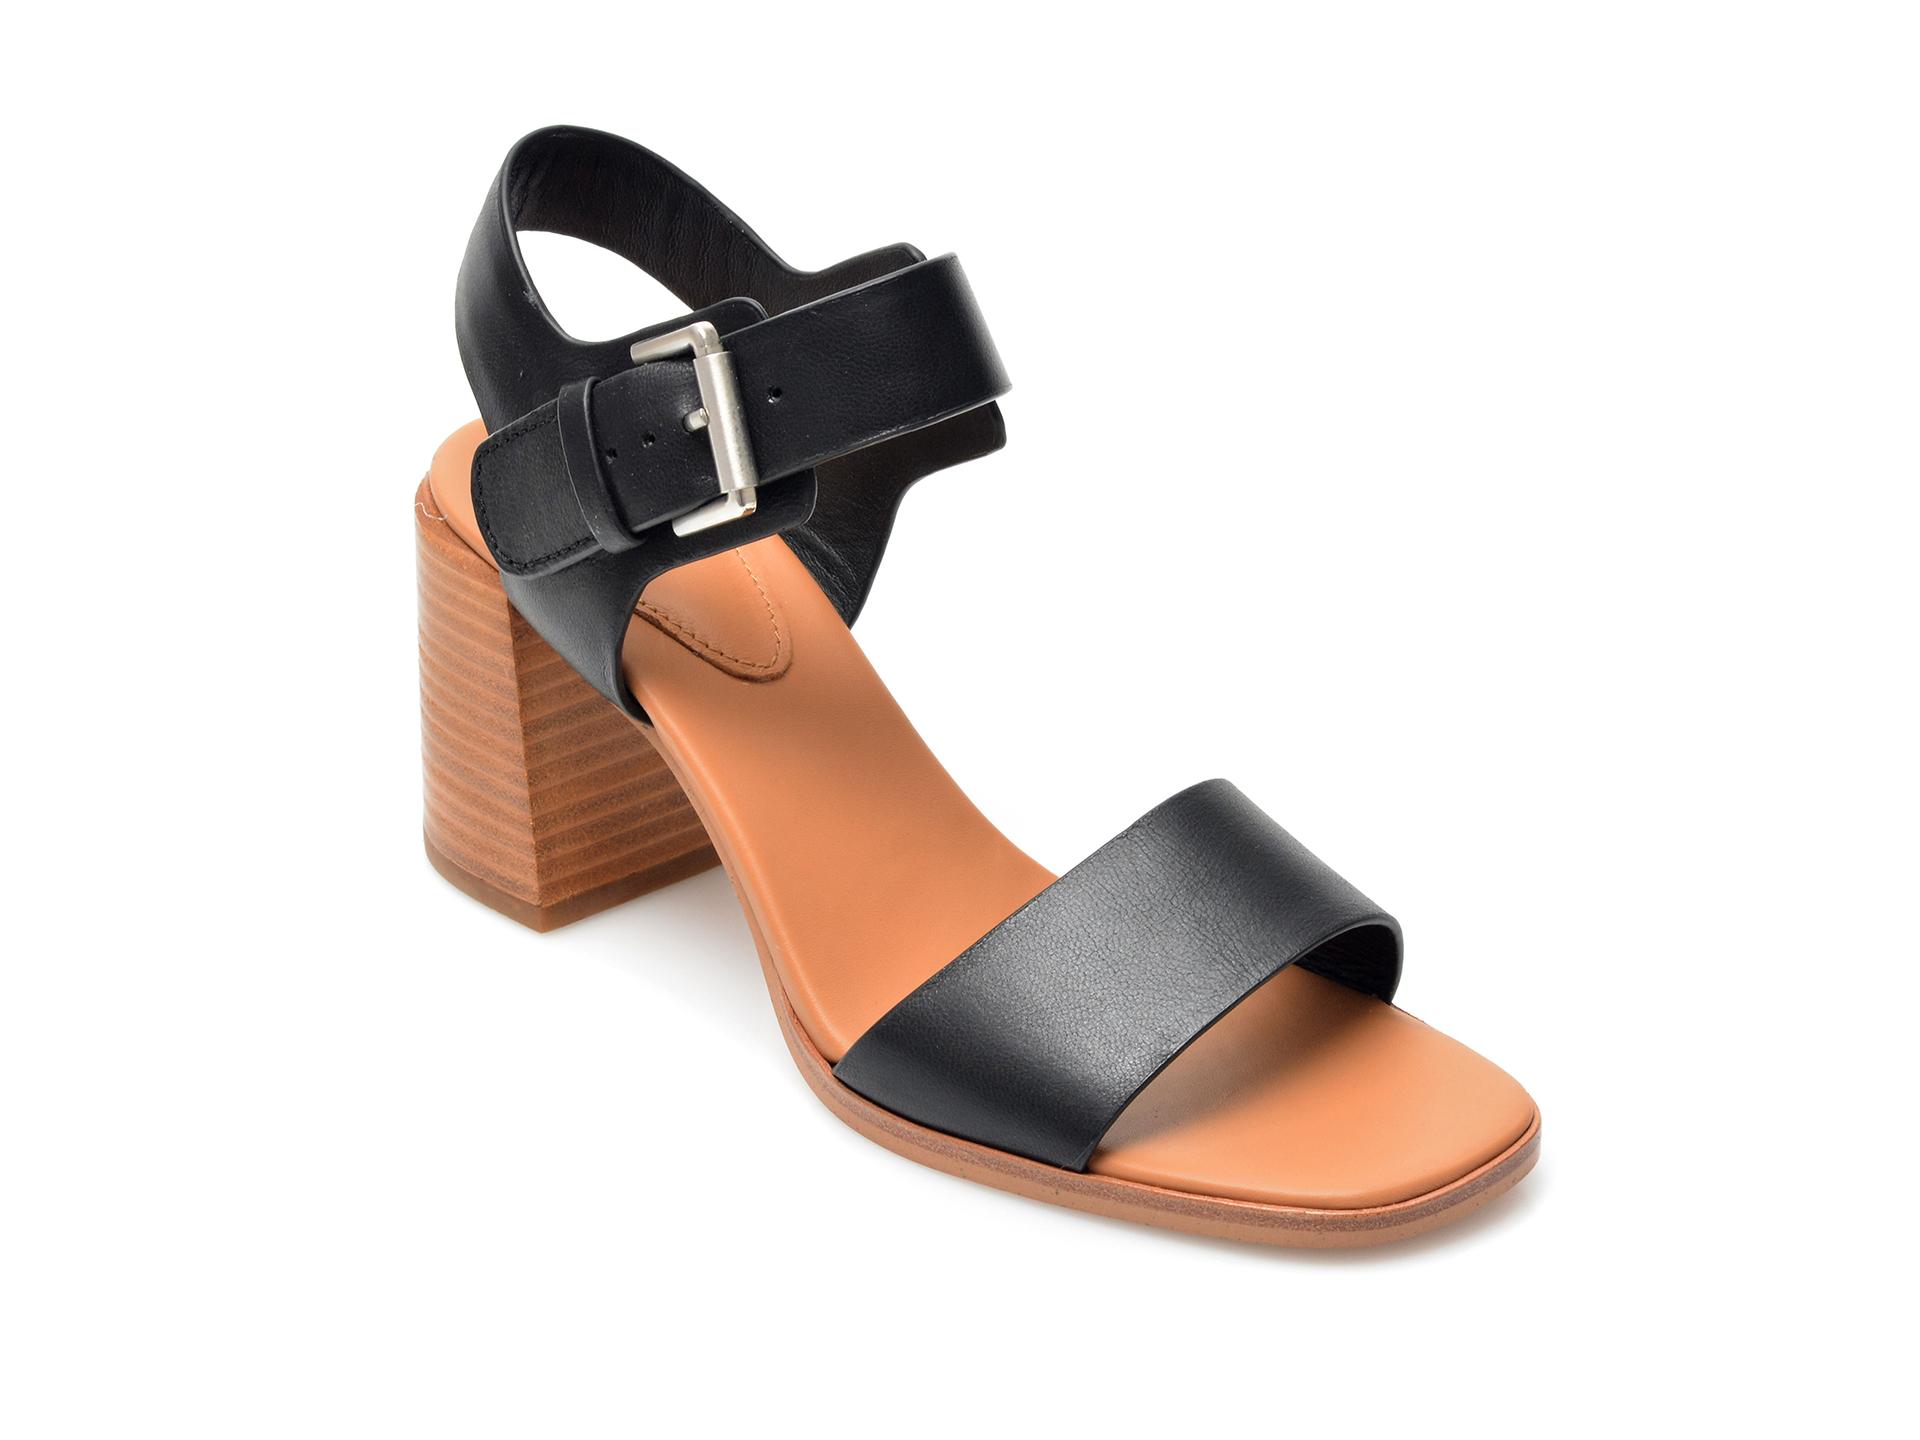 Sandale CLARKS negre, Landra70 Strap, din piele naturala imagine otter.ro 2021